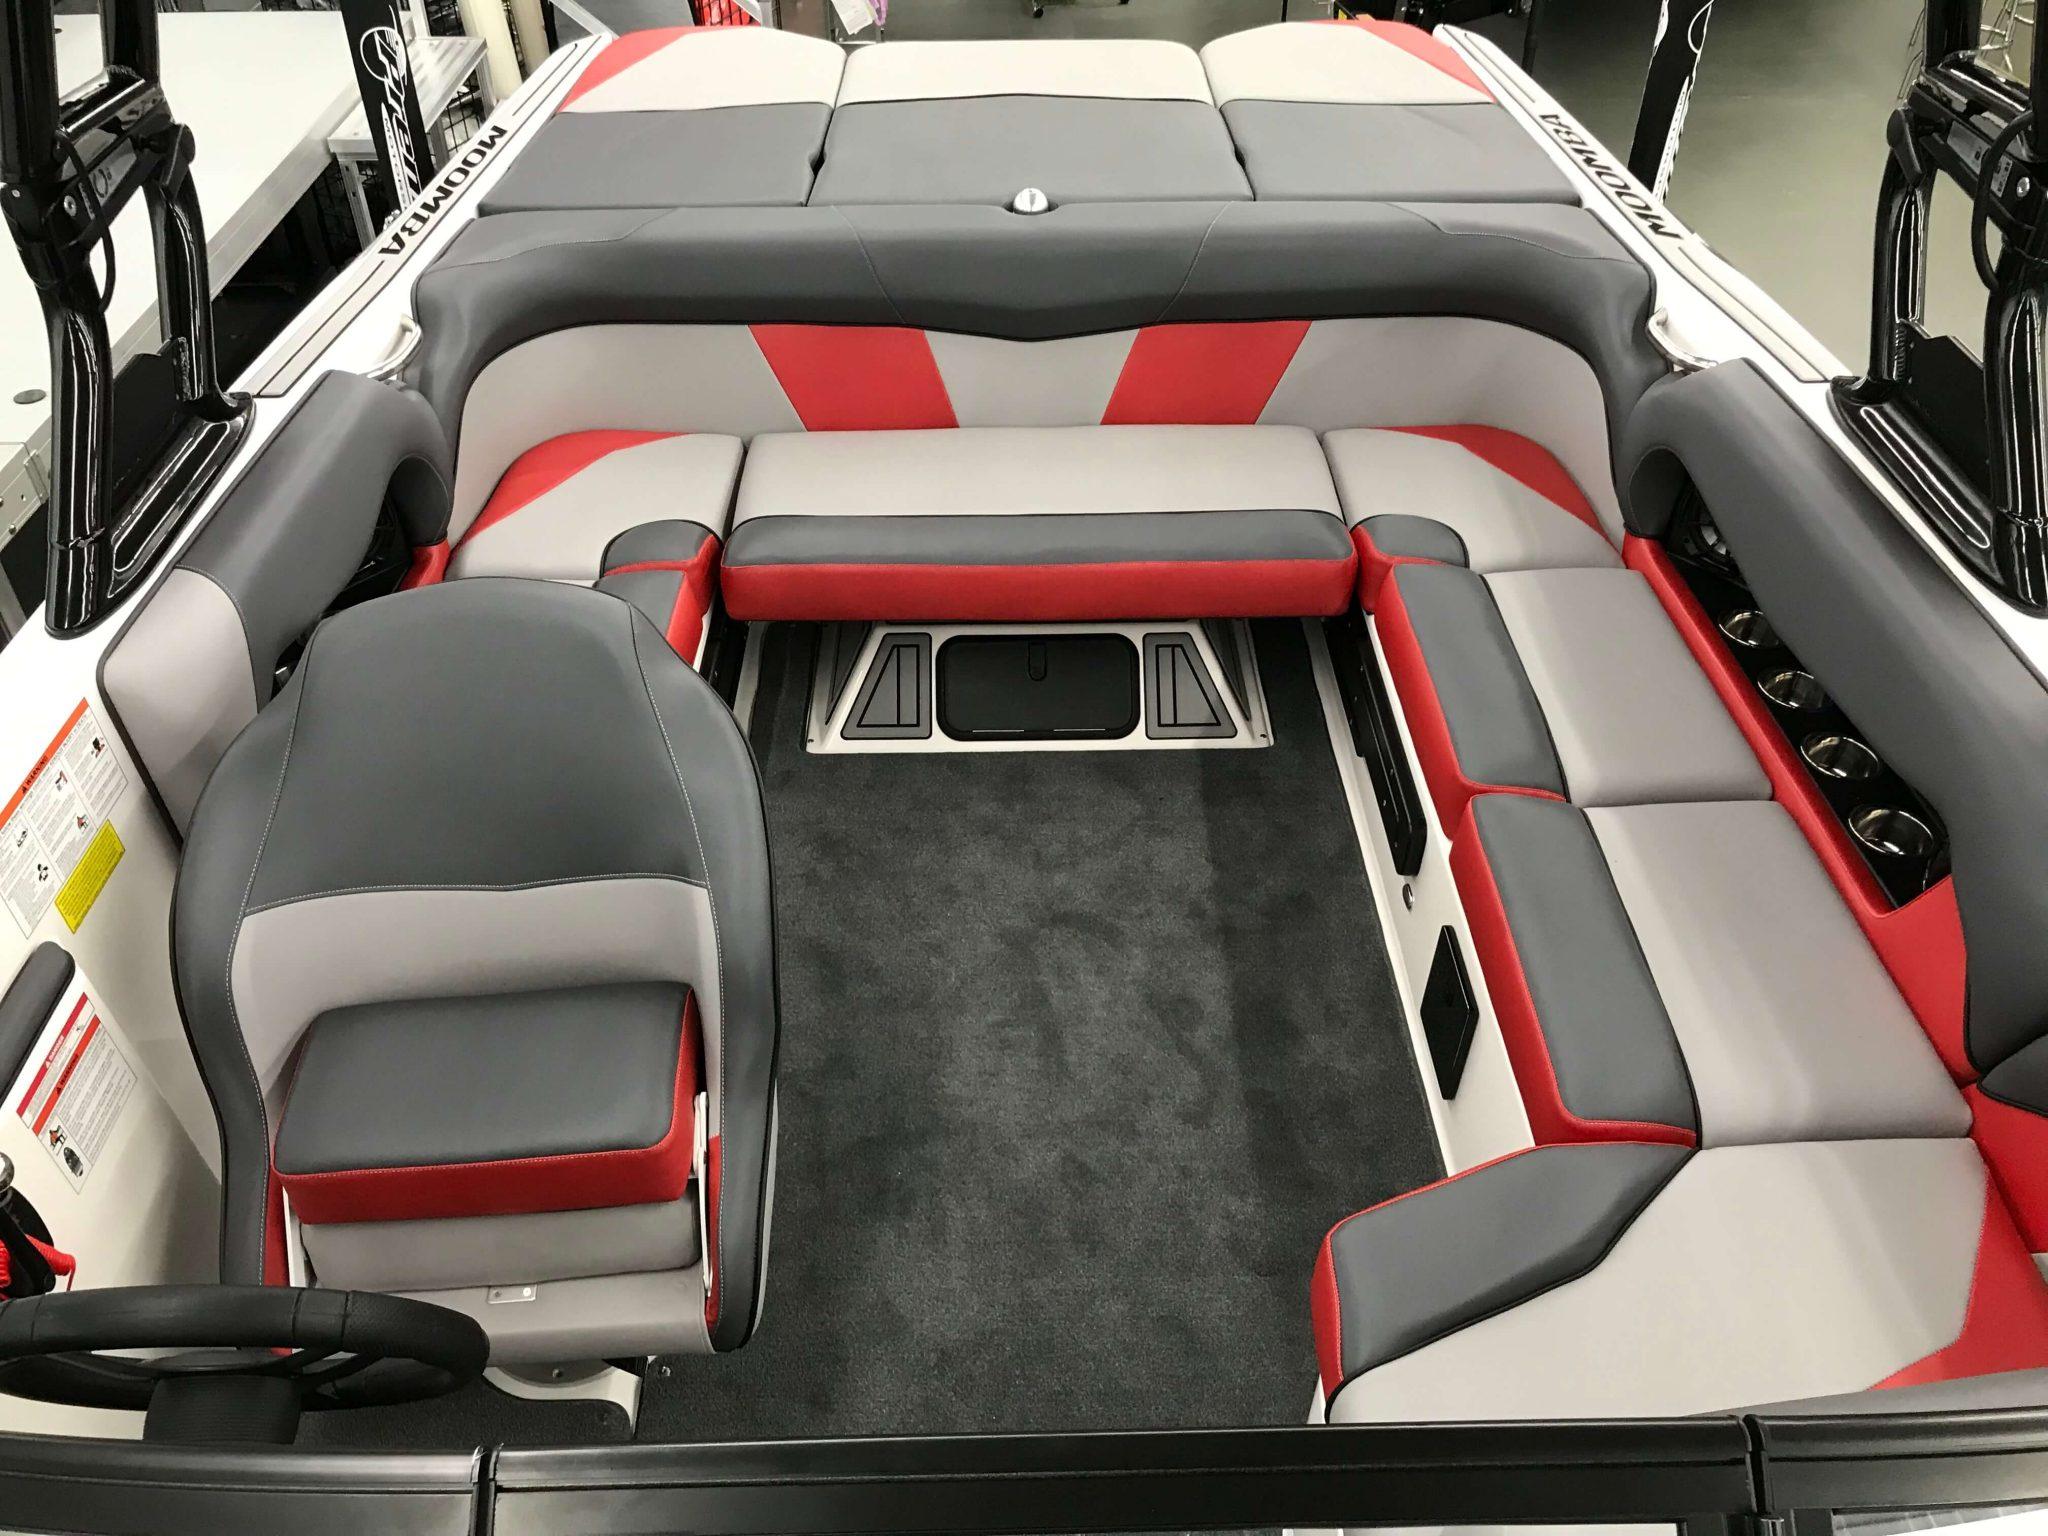 2019 Moomba Mondo Cockpit 2